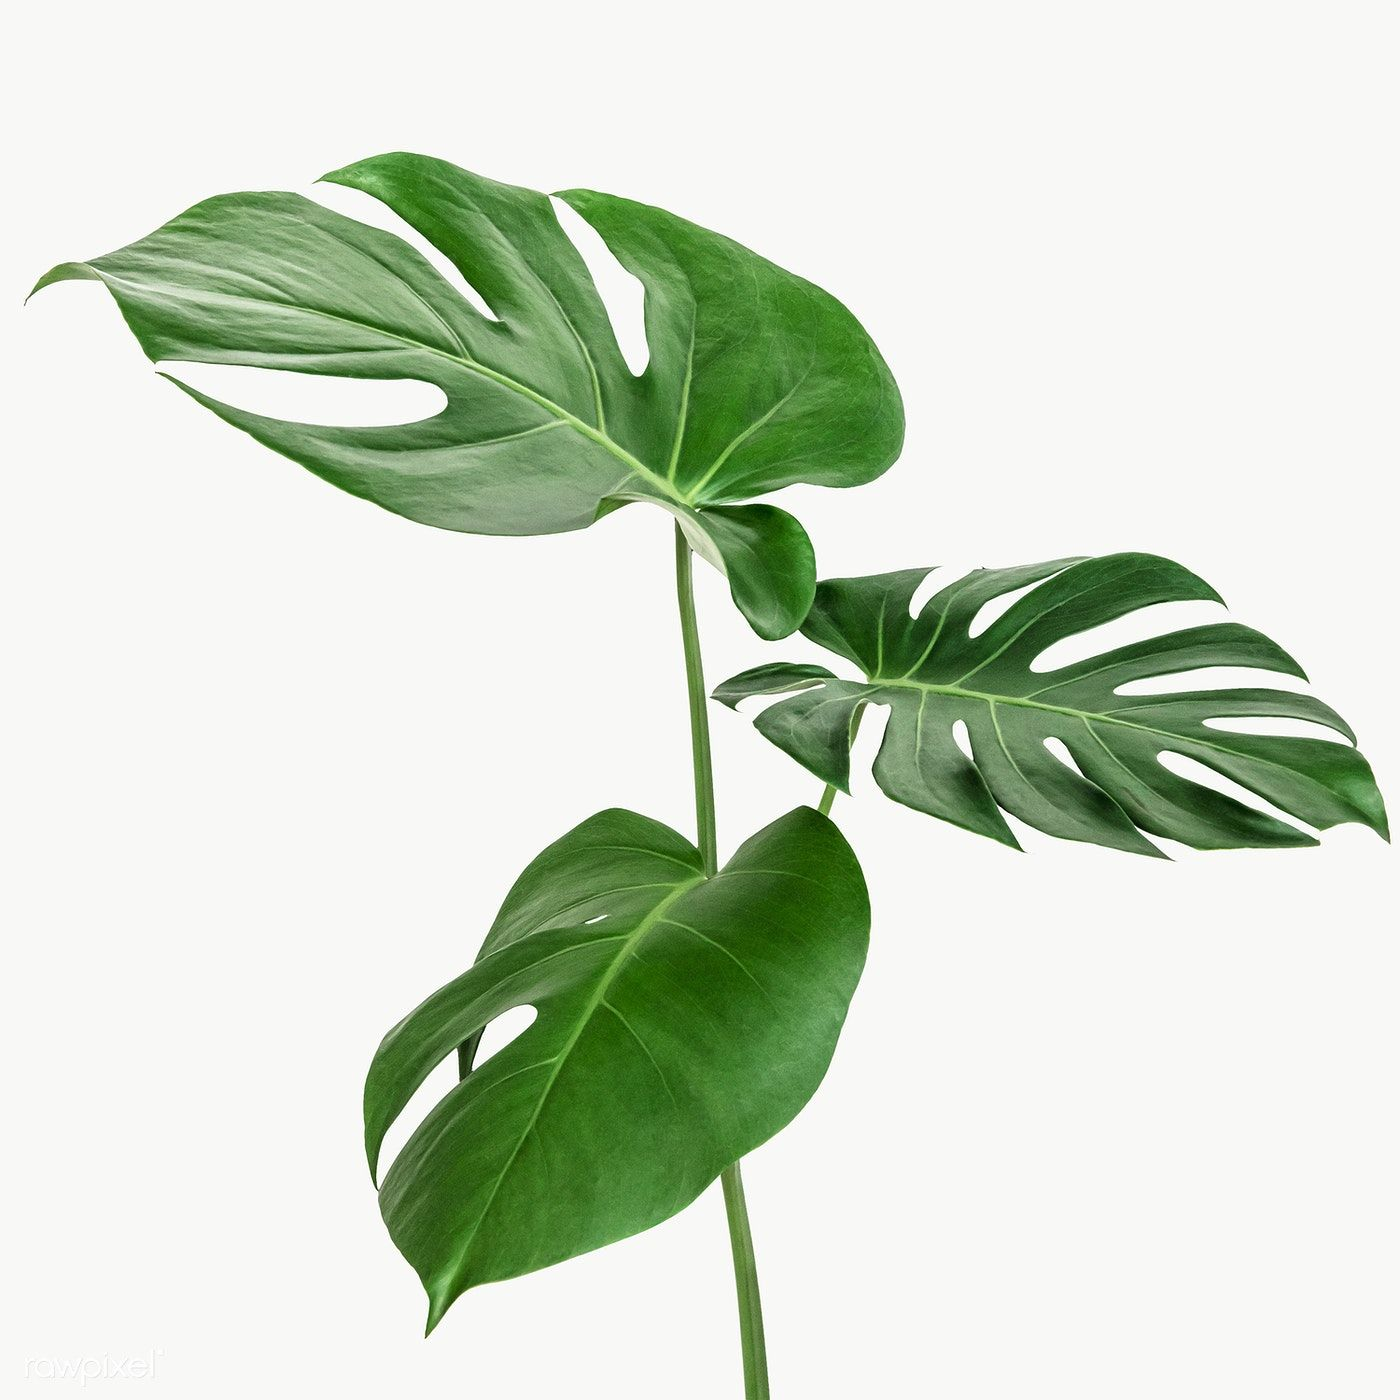 Split Leaf Philodendron Monstera Plant Element Transparent Png Free Image By Rawpixel Com Teddy Rawpixel Tanaman Hijau Cetakan Bunga Tanaman